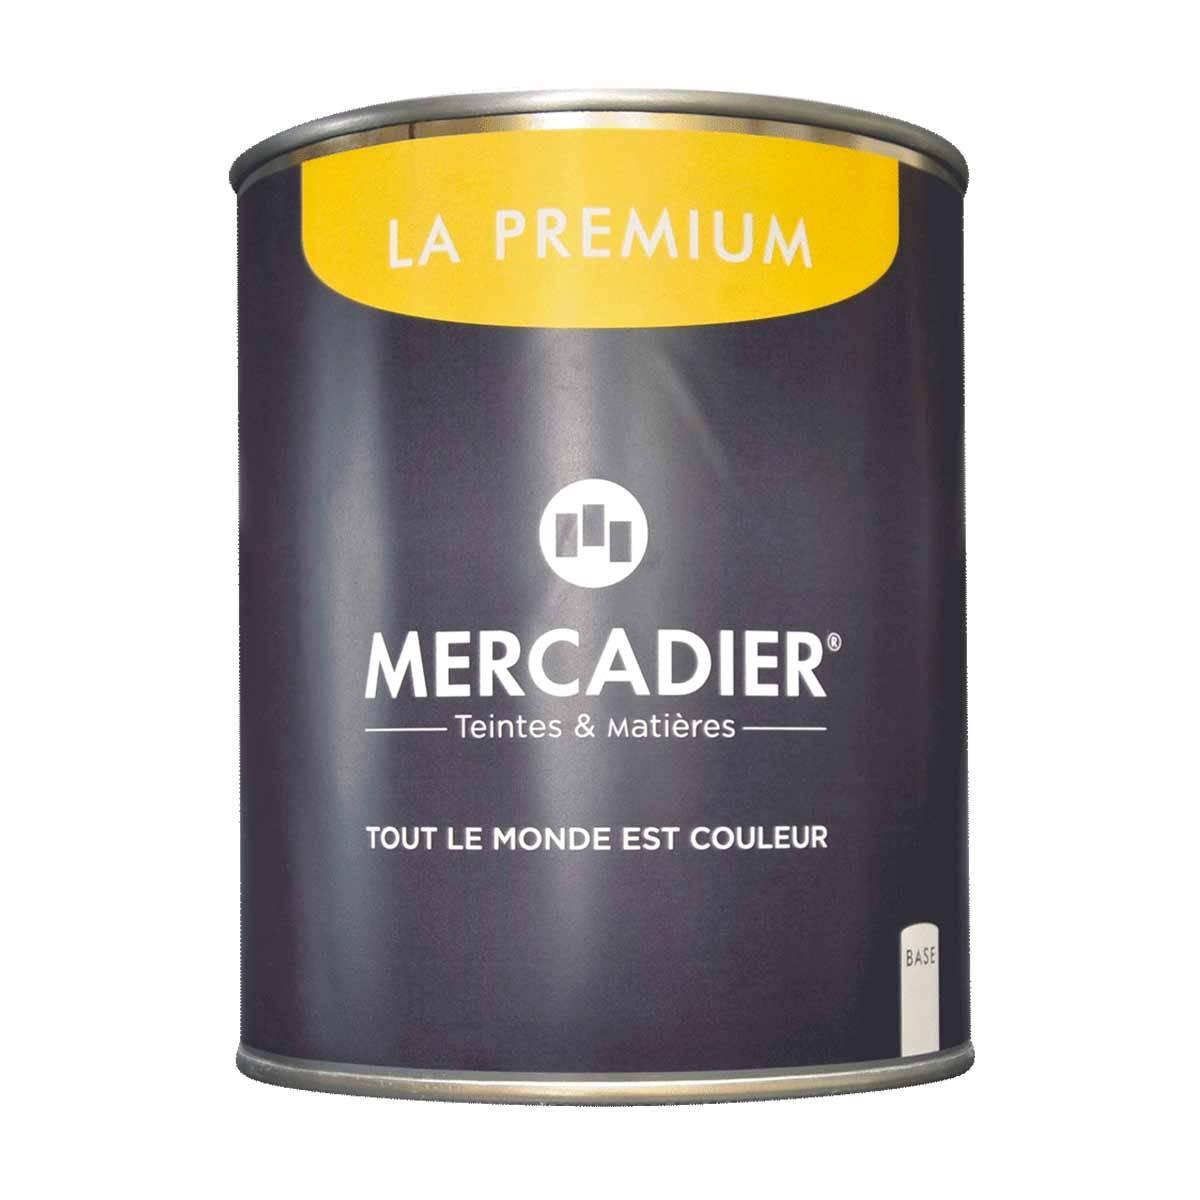 peinture d corative murale la premium mangosta mercadier port offert partir de 99 ttc. Black Bedroom Furniture Sets. Home Design Ideas